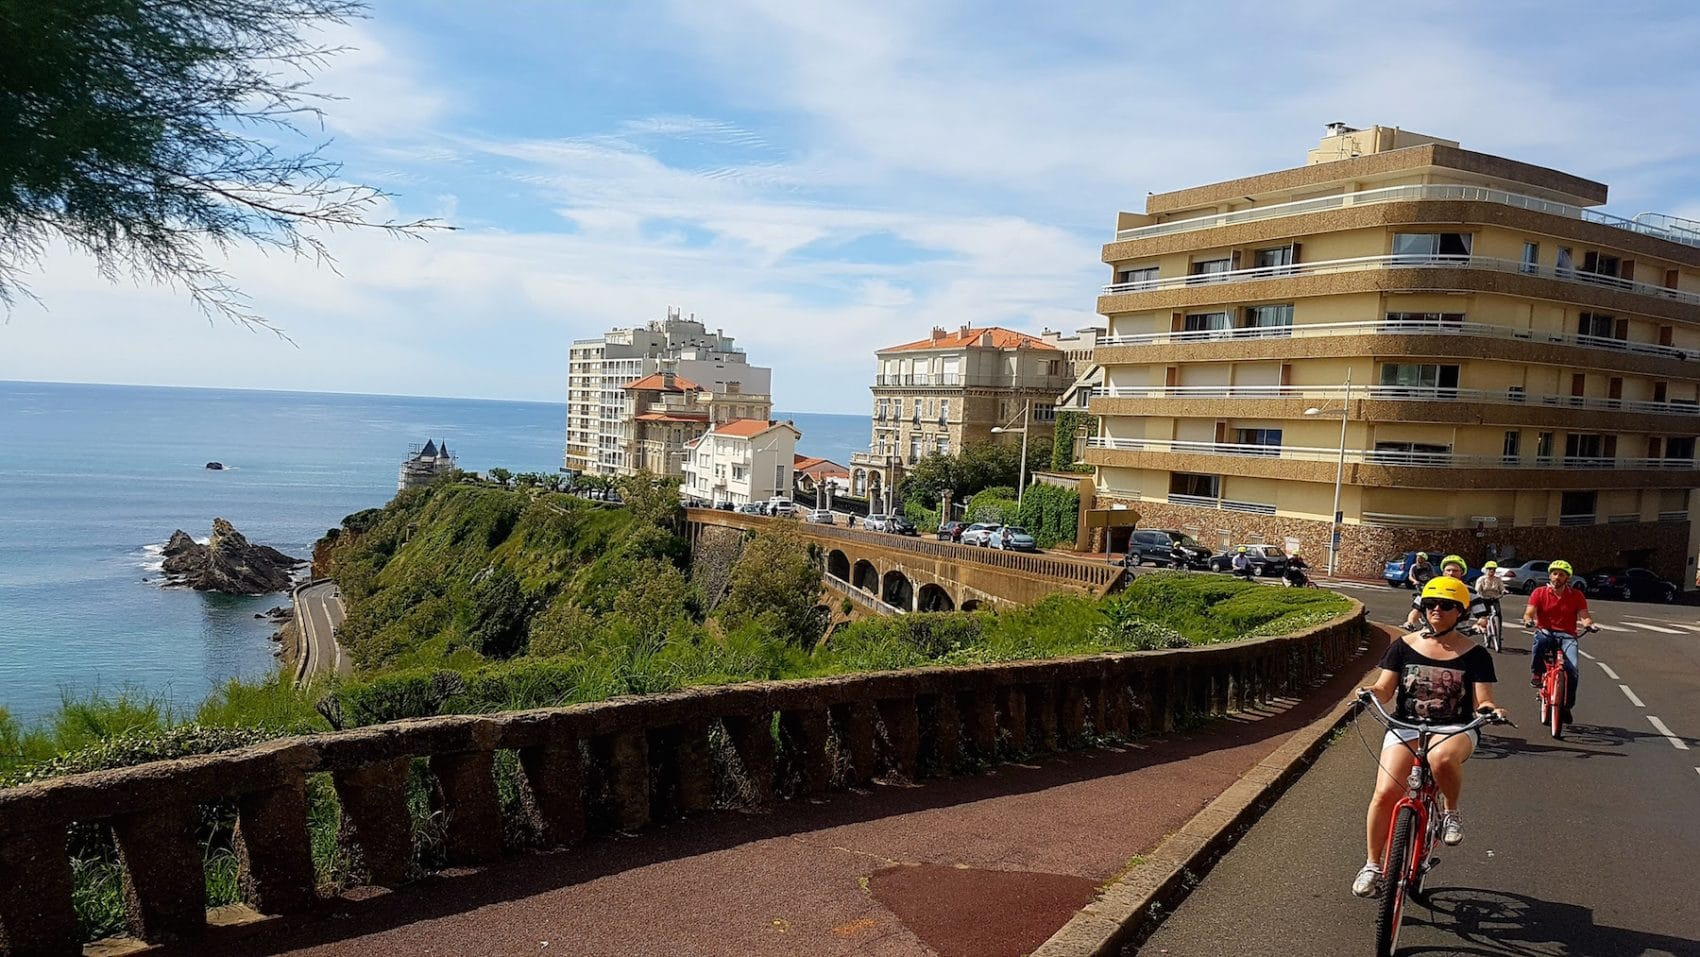 visite-biarritz-guides-biarritz-visiter-biarritz